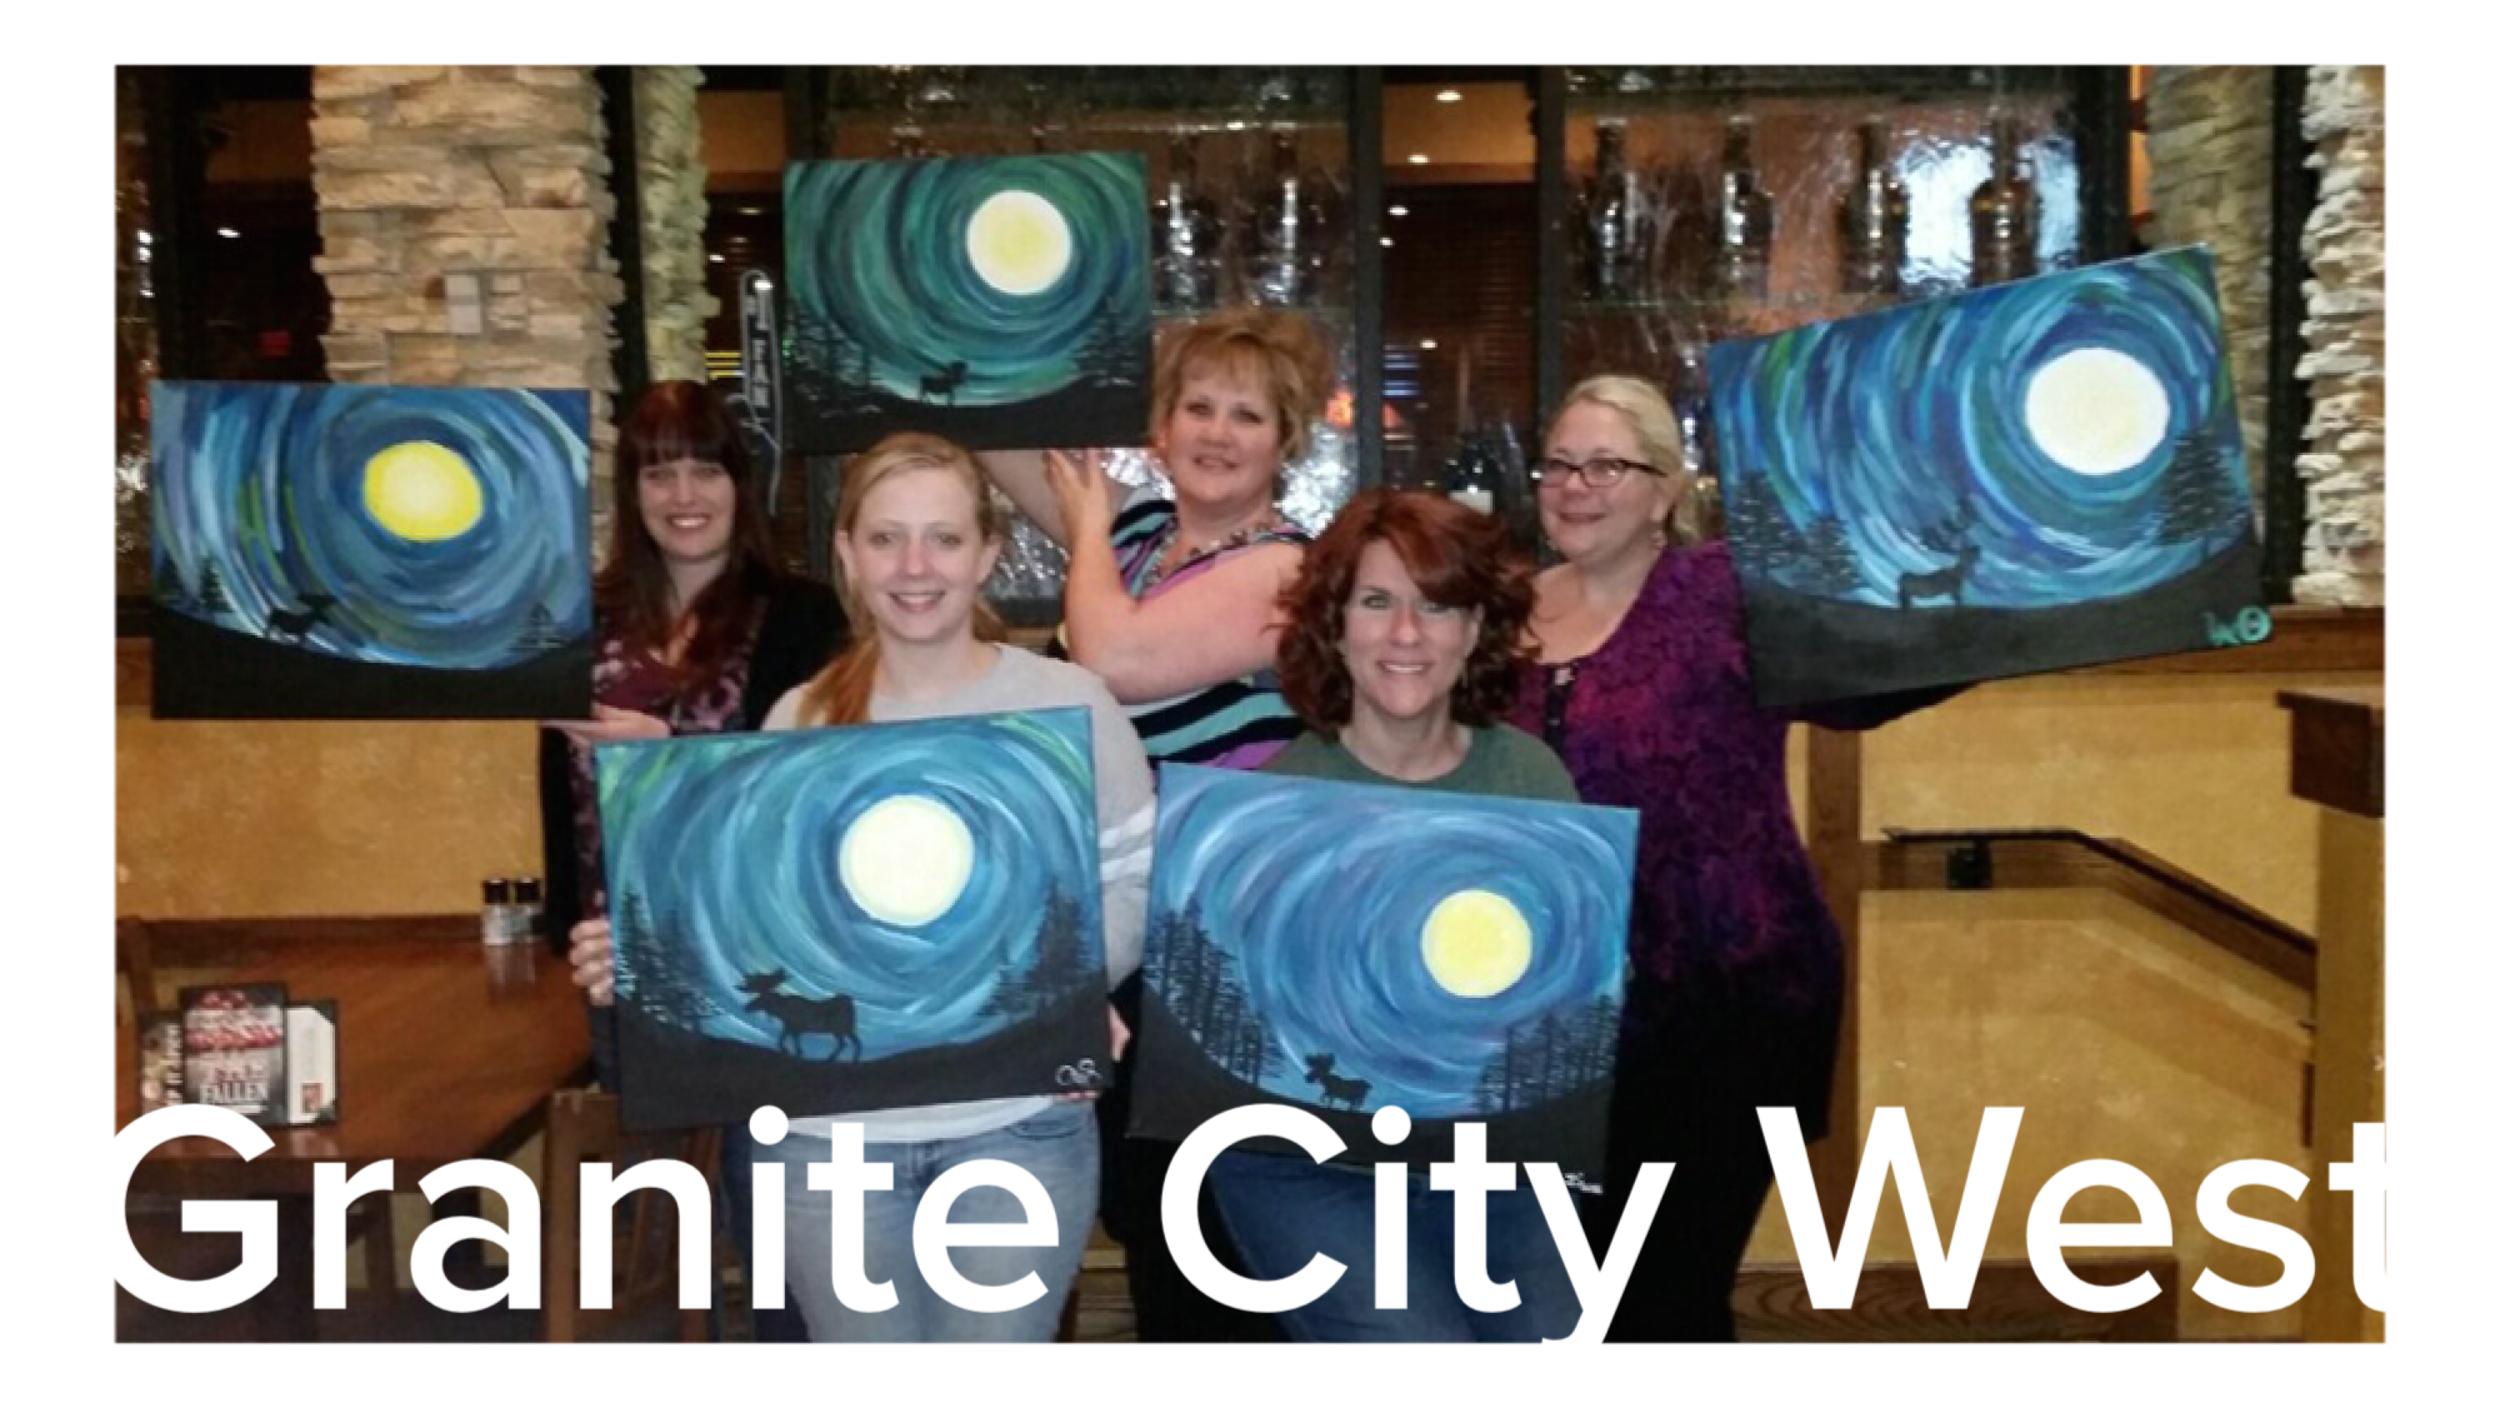 Granite City West, Wichita KS